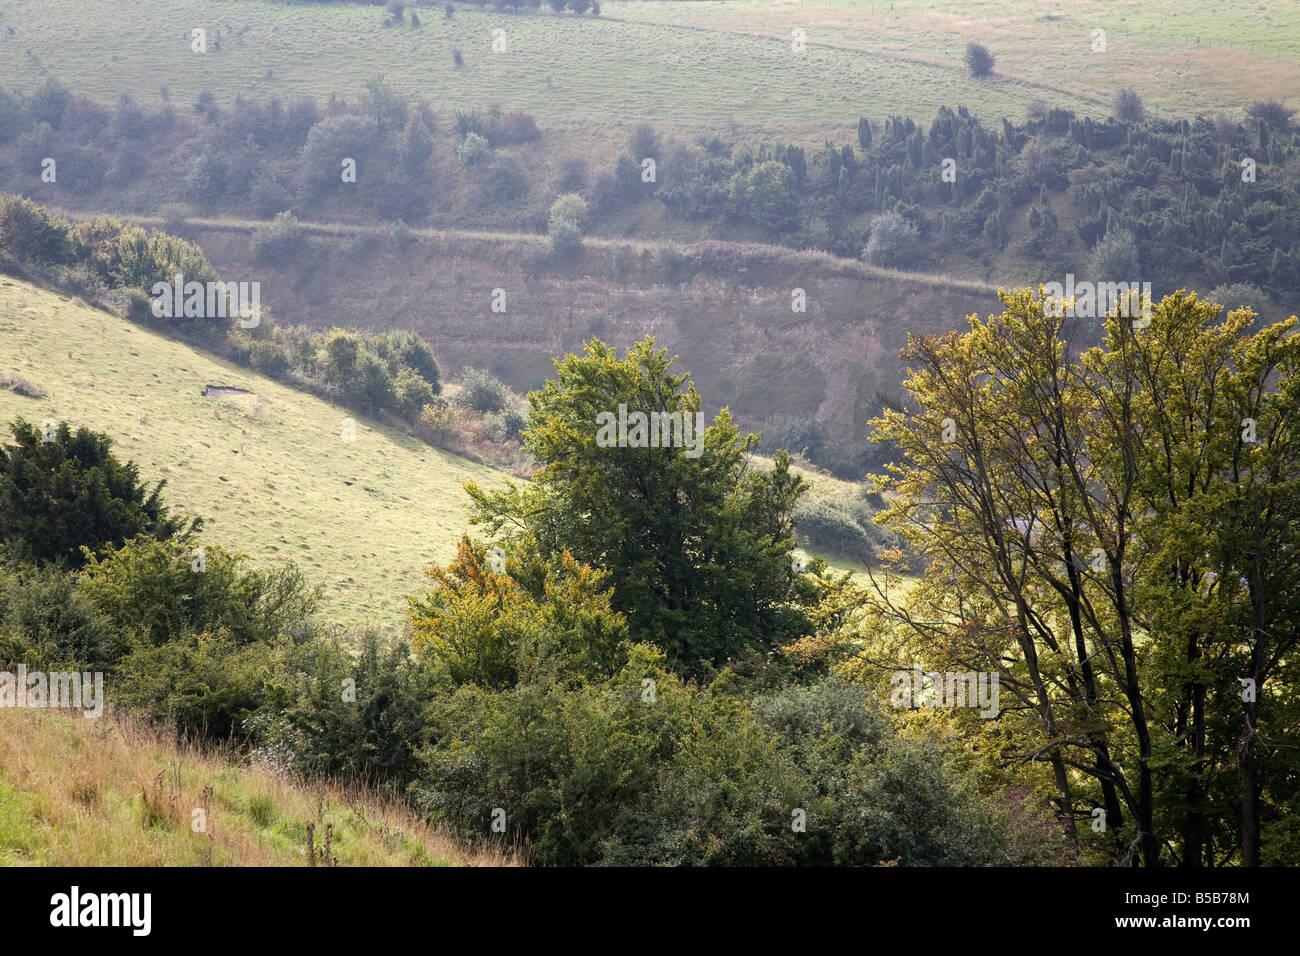 aston rowant chilterns oxfordshire - Stock Image